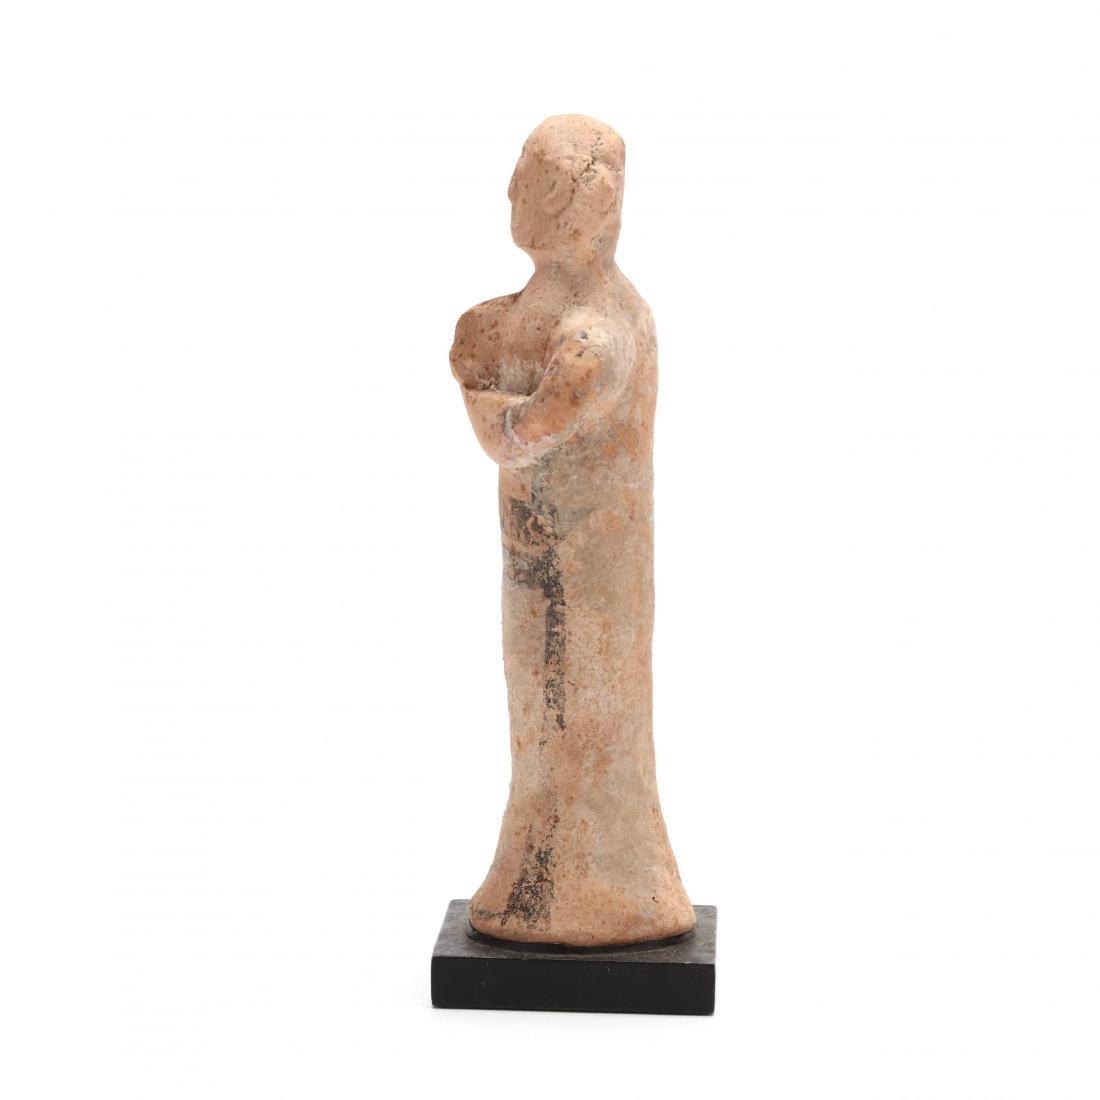 Cypro-Archaic Terracotta Musician or Votive - 4